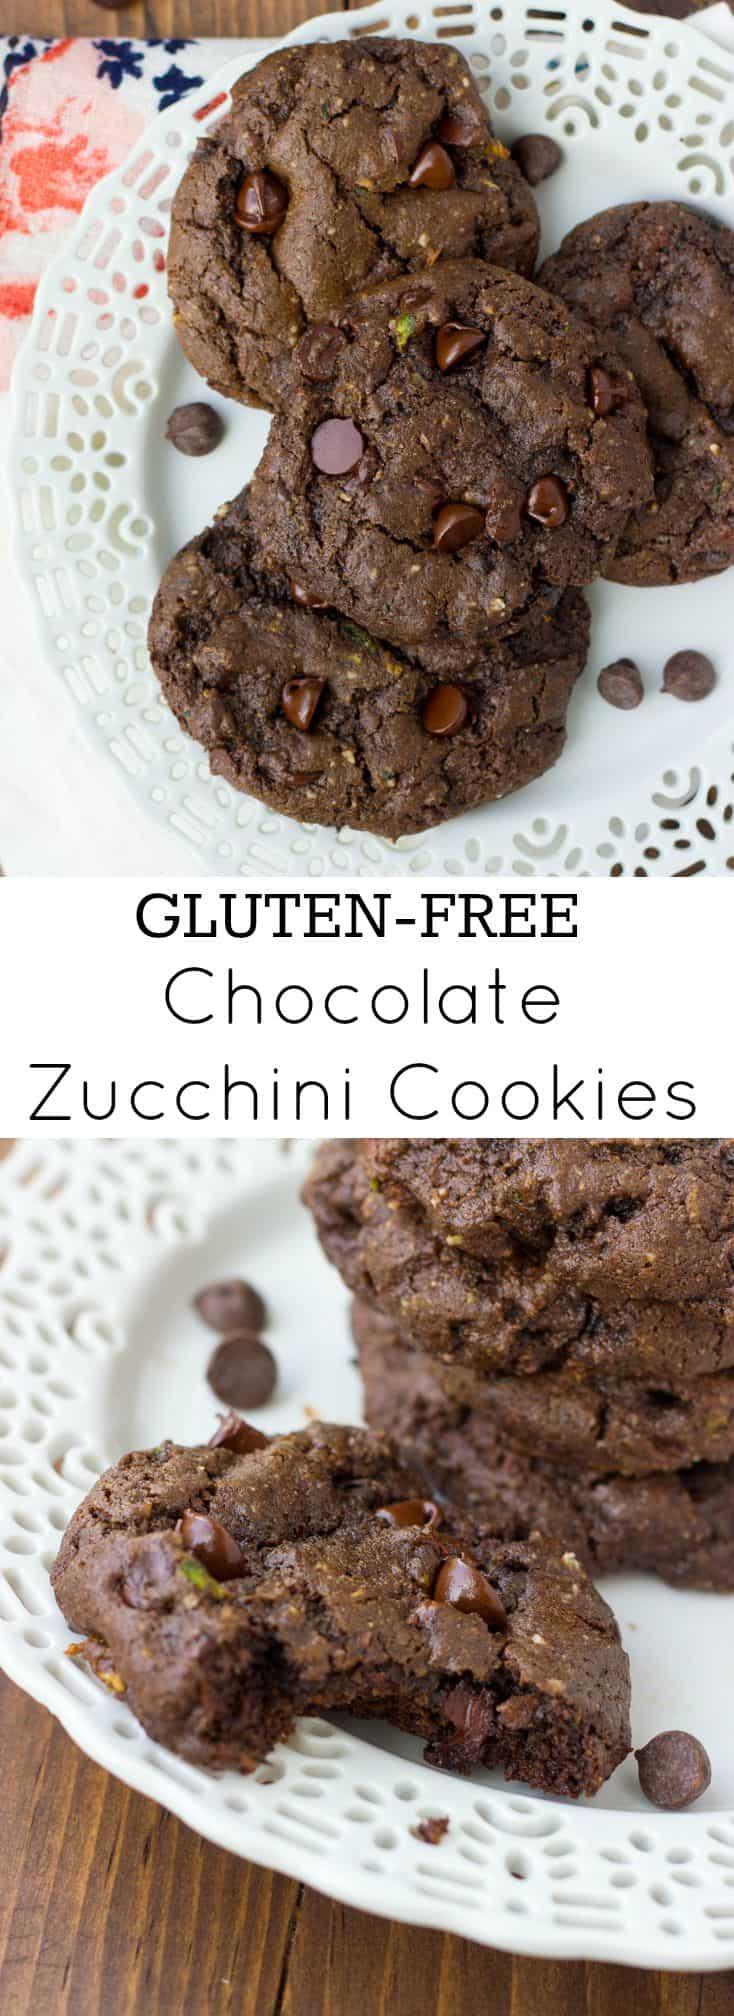 Gluten-Free Triple Chocolate Zucchini Cookies! Fudgey, rich and chocolatey. {Dairy-Free}